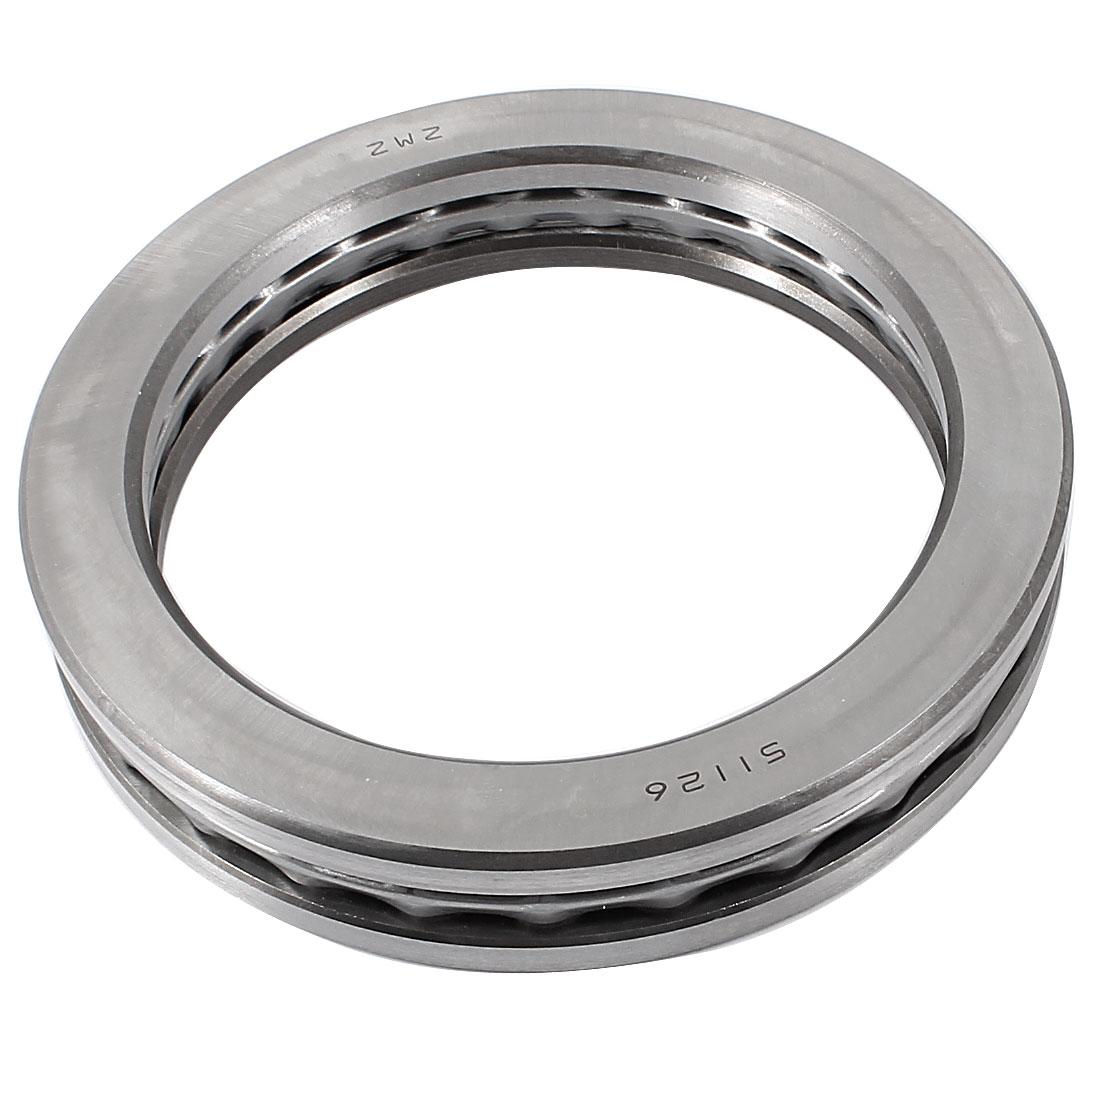 Carbon Steel Ball Thrust Bearing 51126 130mm x 170mm x 30mm